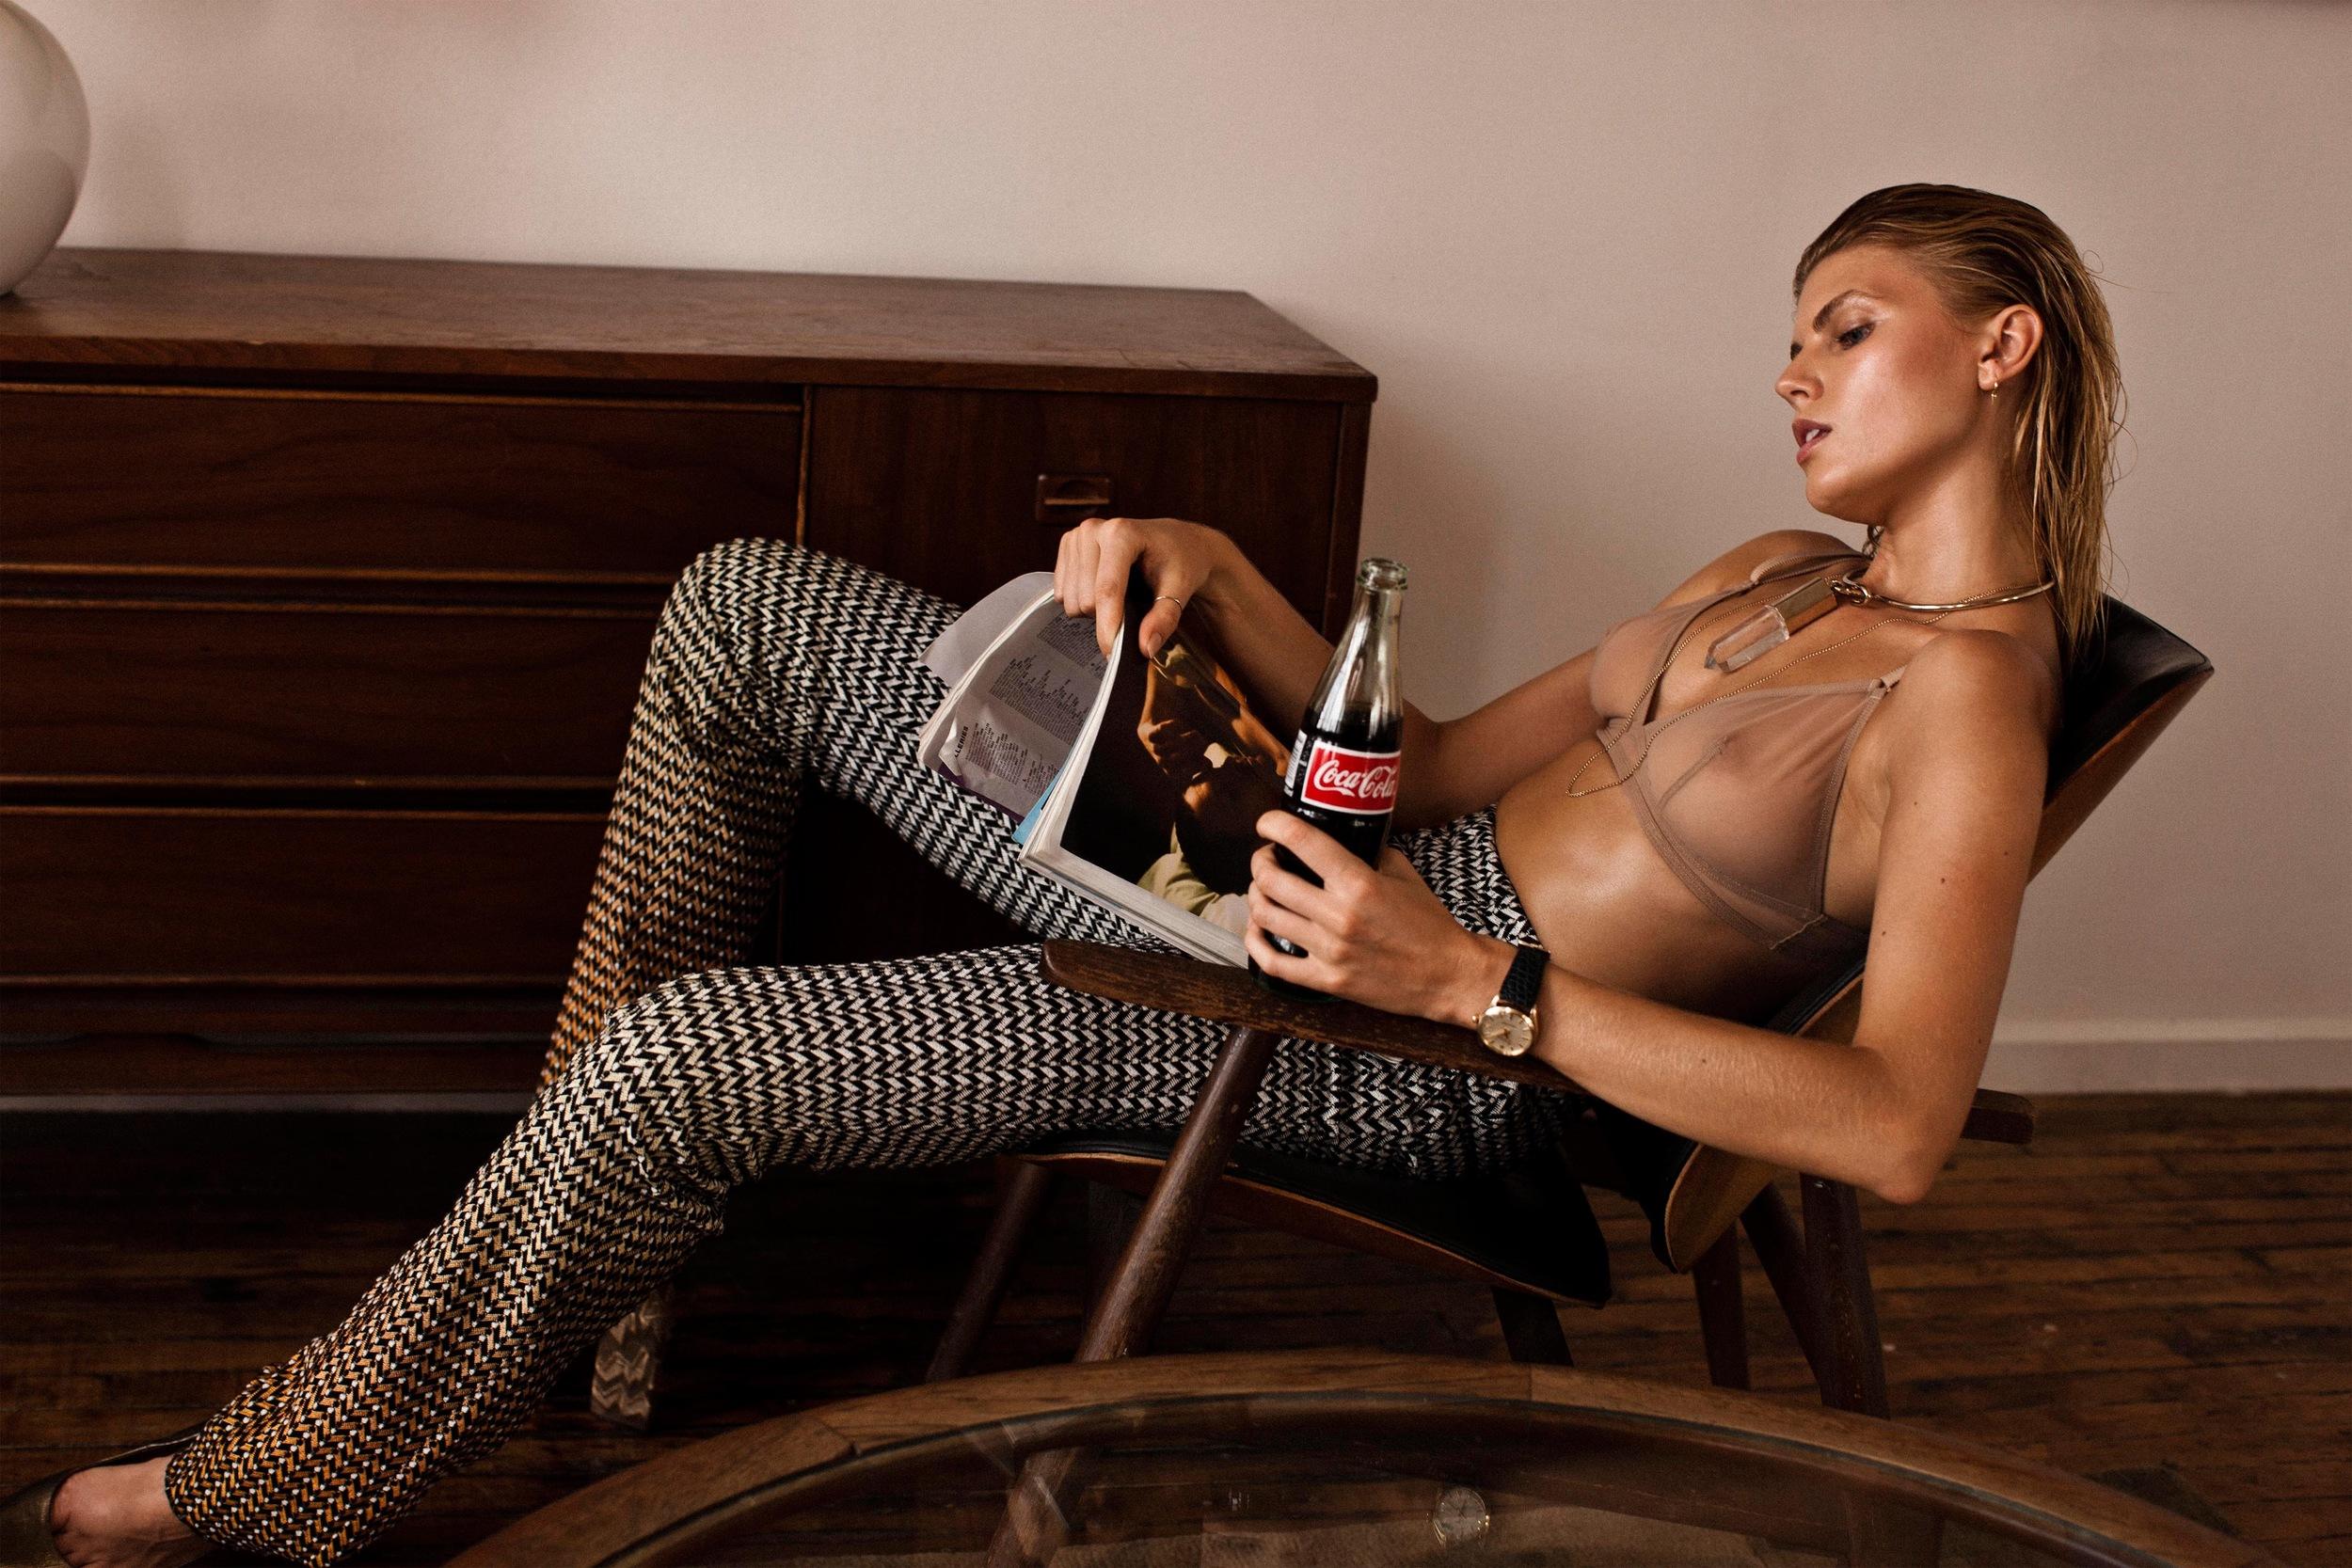 Maryna_Linchuk-Victor_Demarchelier-25_Magazine-03-itr2010.jpeg